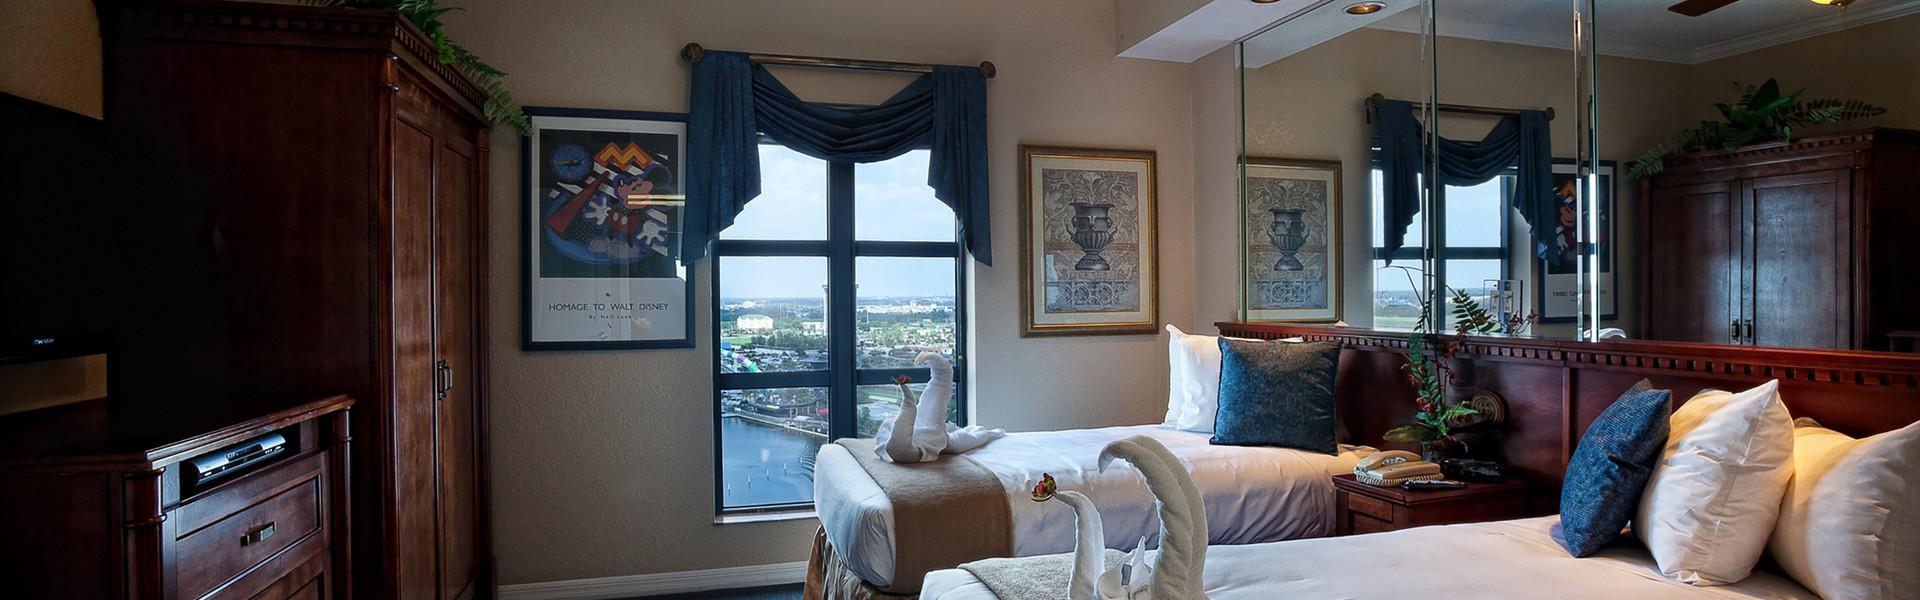 2 Bedroom Resorts in Orlando FL | Resorts Near I Drive Orlando, FL 32819 | Westgate Palace Resort